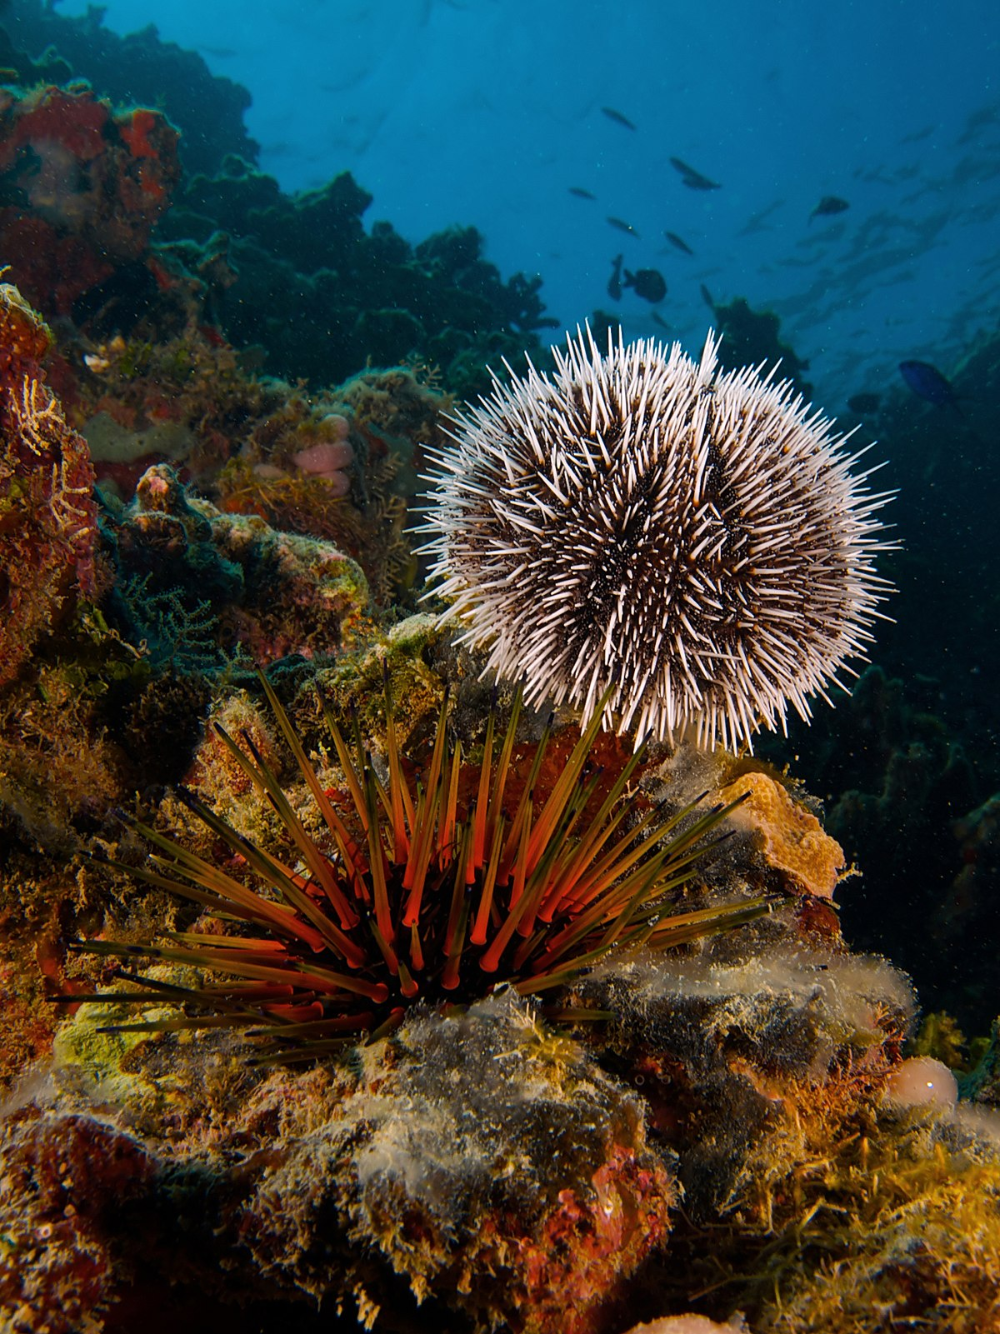 Pin By Martin Erwin Muller Gelinek On Que Nota In 2020 Sea Egg Sea Urchin Sea Animals